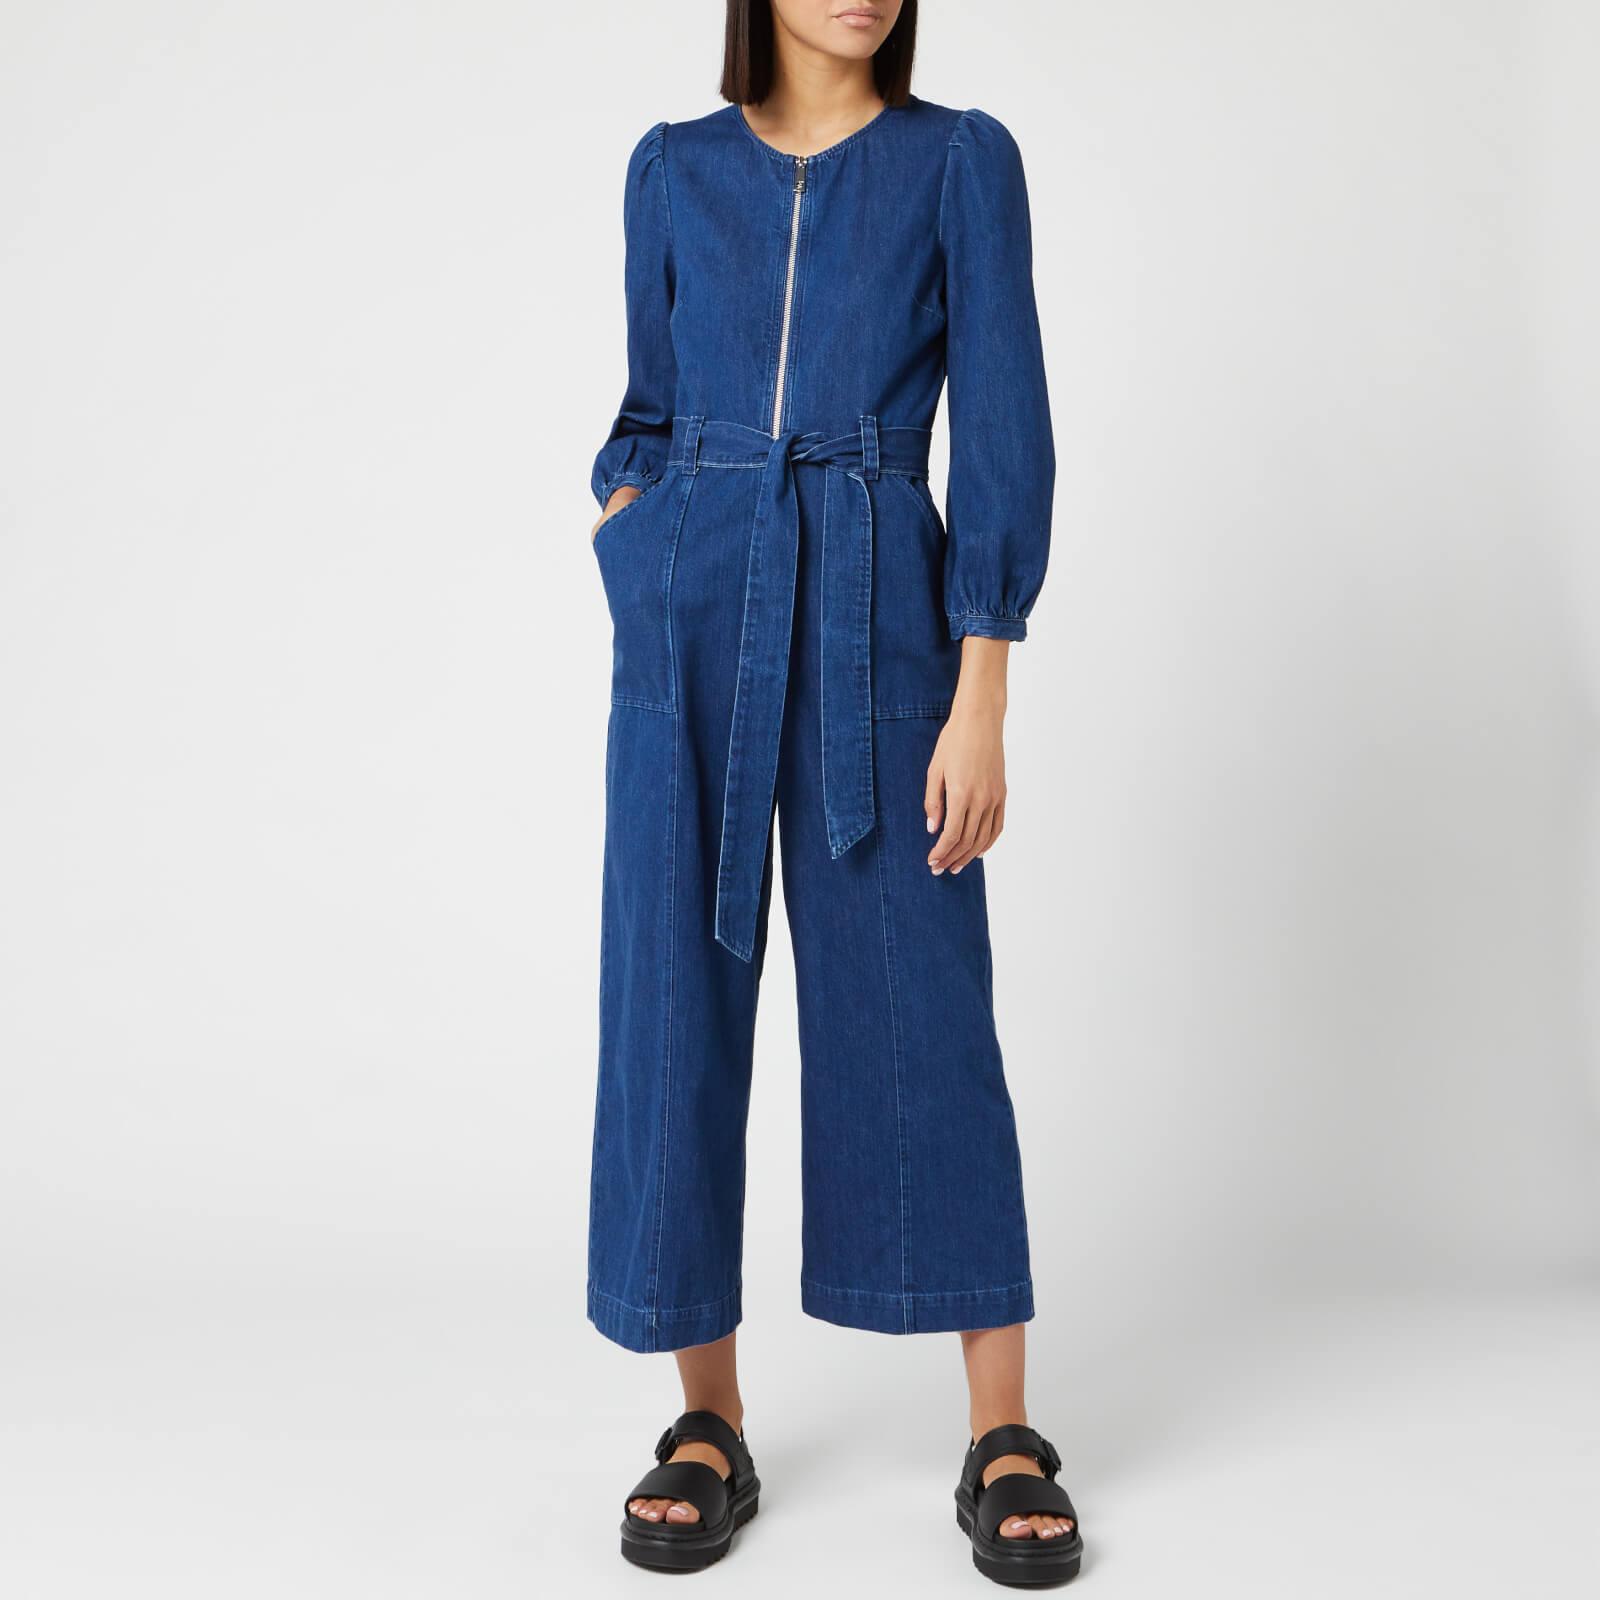 Whistles Women's Estelle Denim Jumpsuit - Blue - UK 12